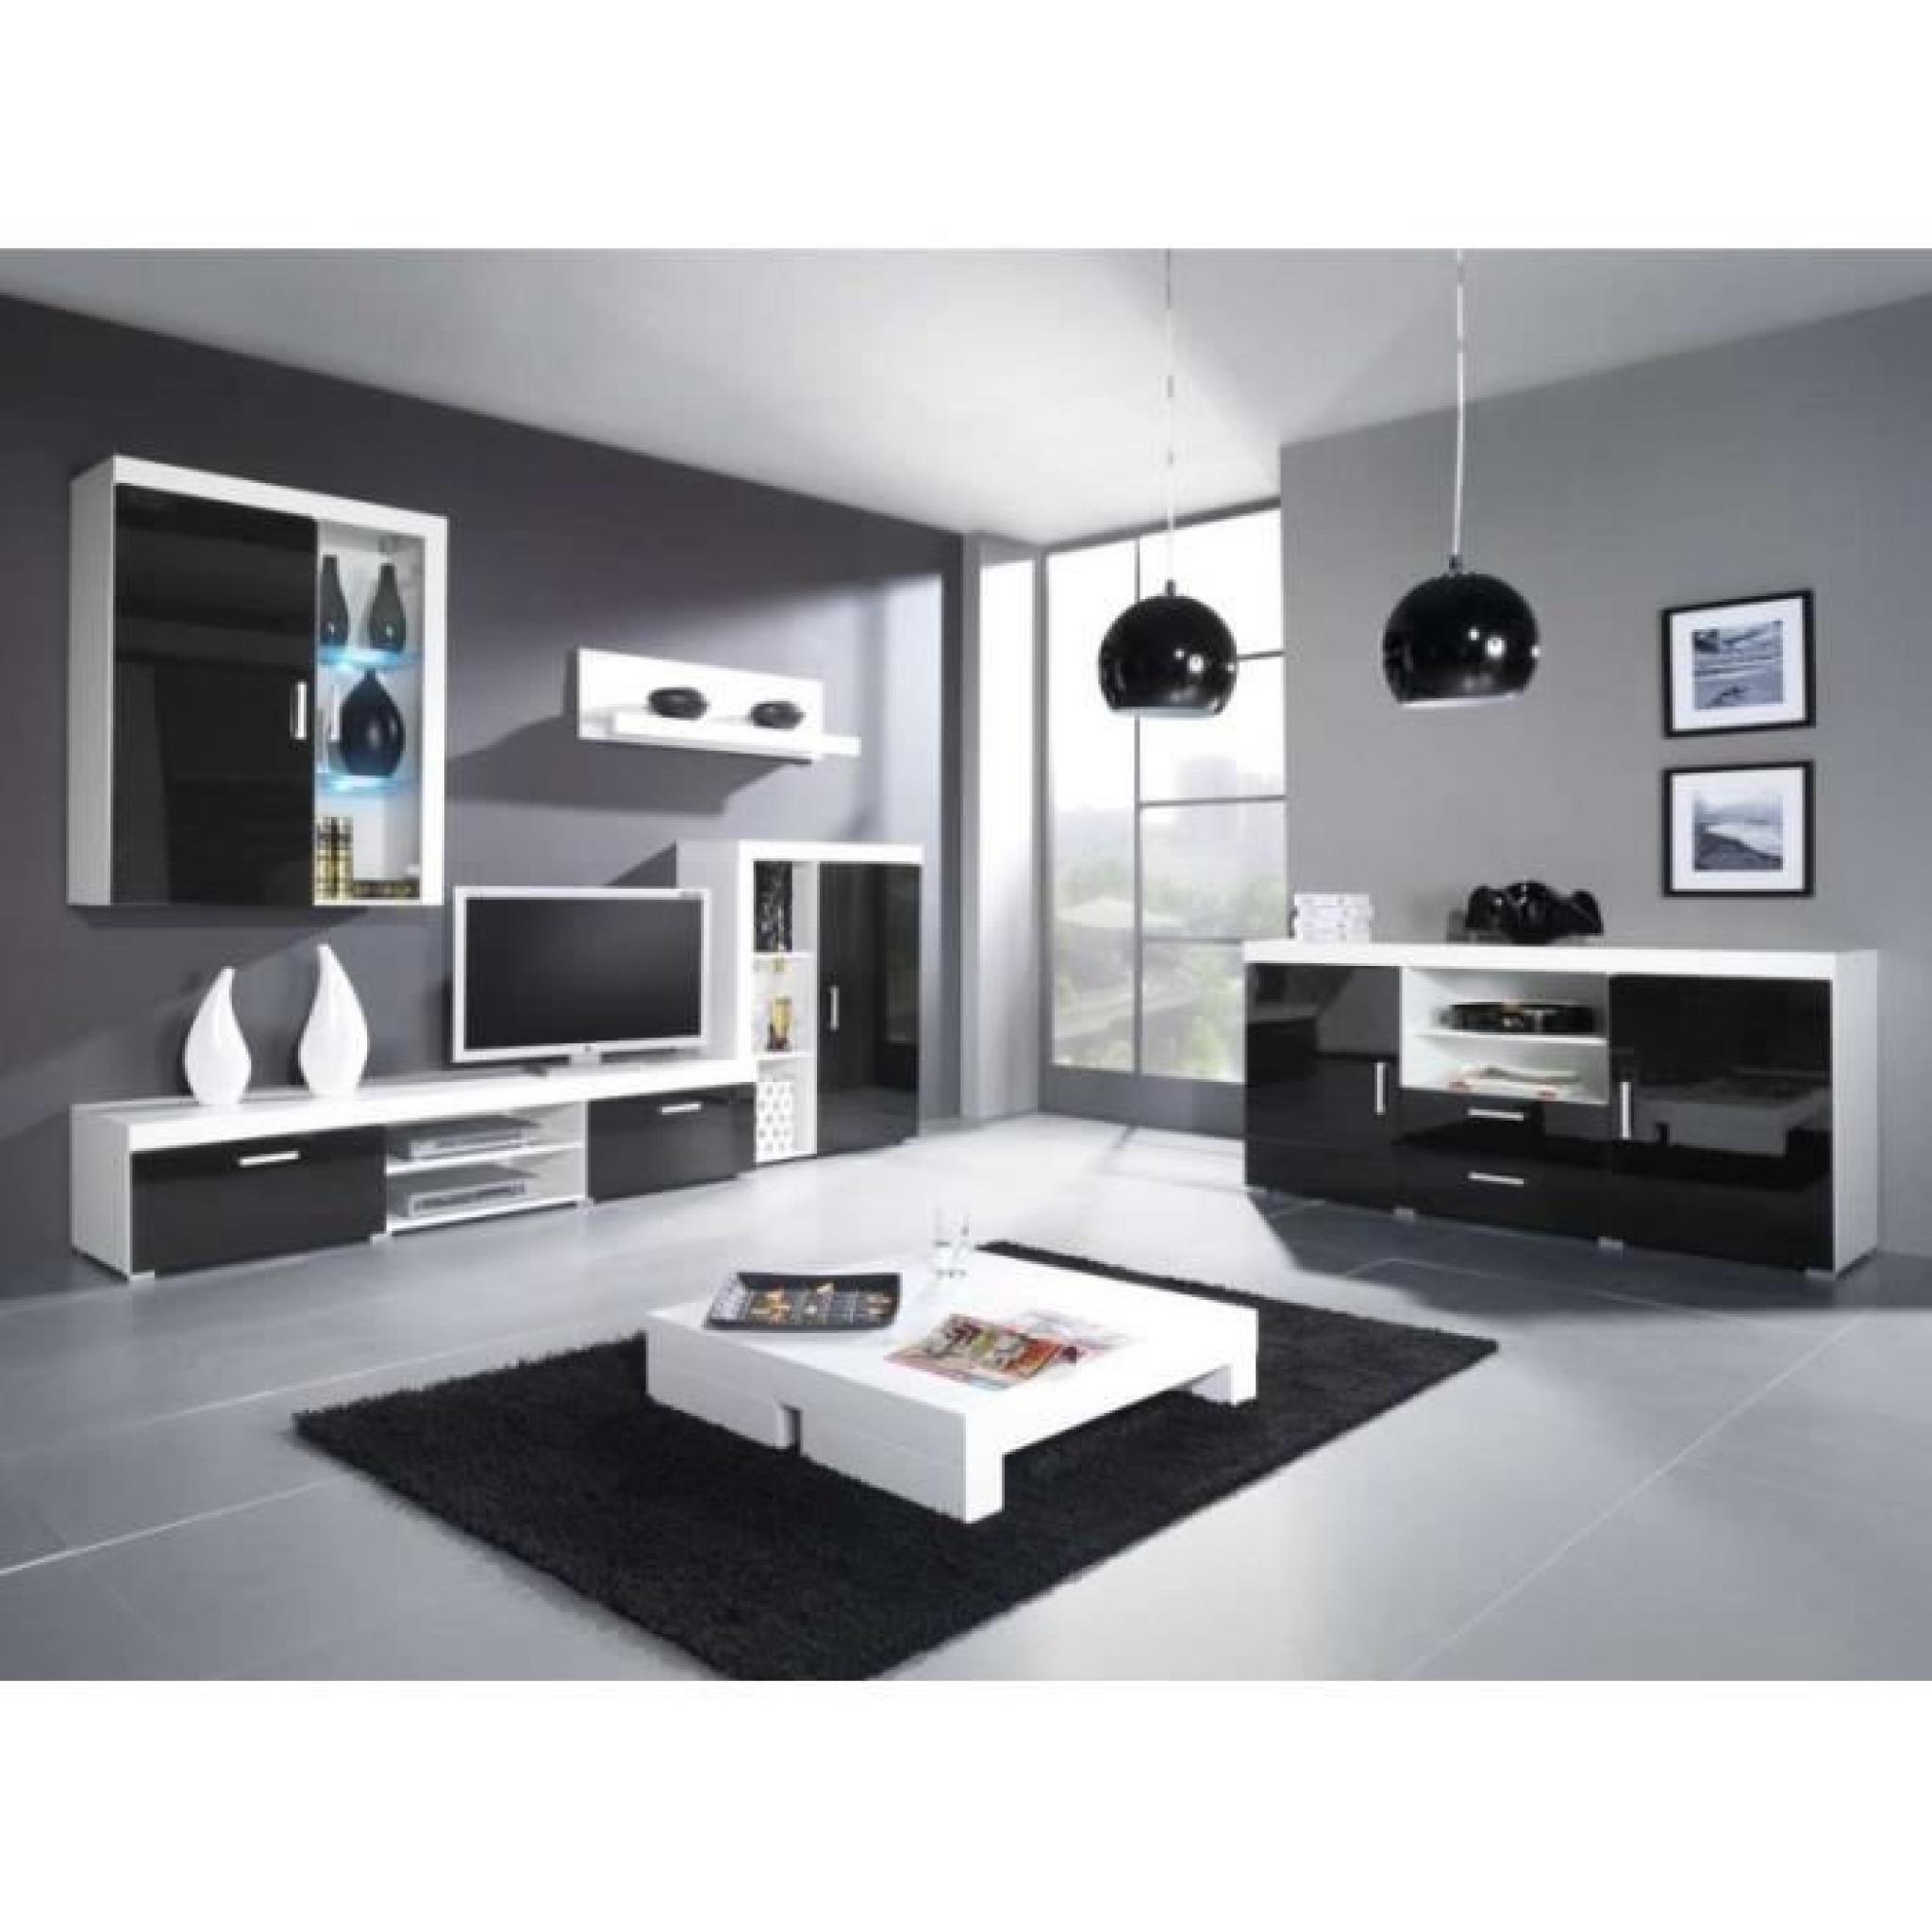 Justhome ensemble samba c unit murale blanc noir for Ensemble salle a manger noir et blanc